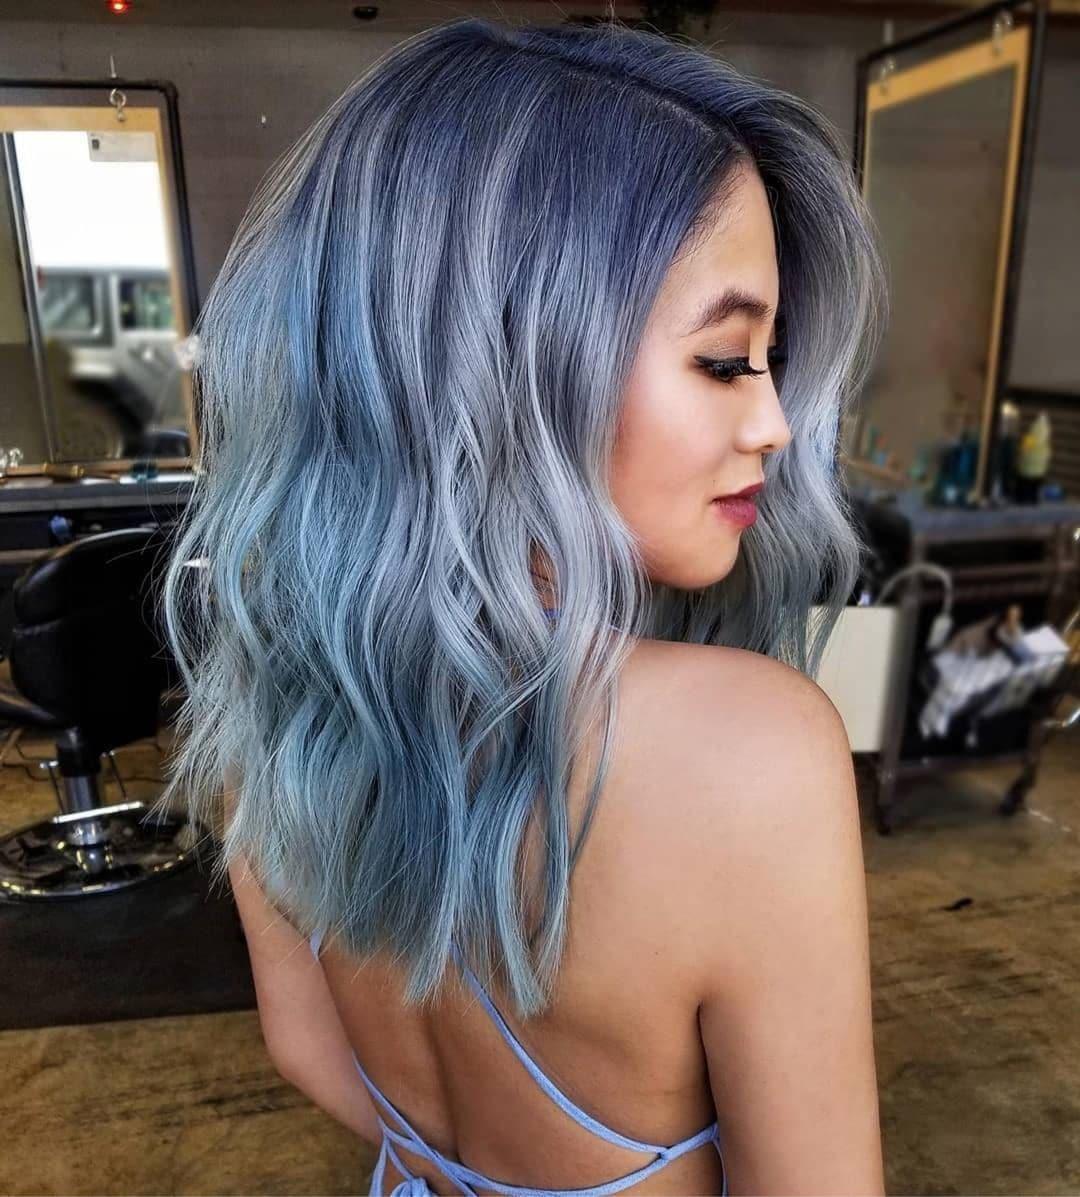 woman with wavy denim hair